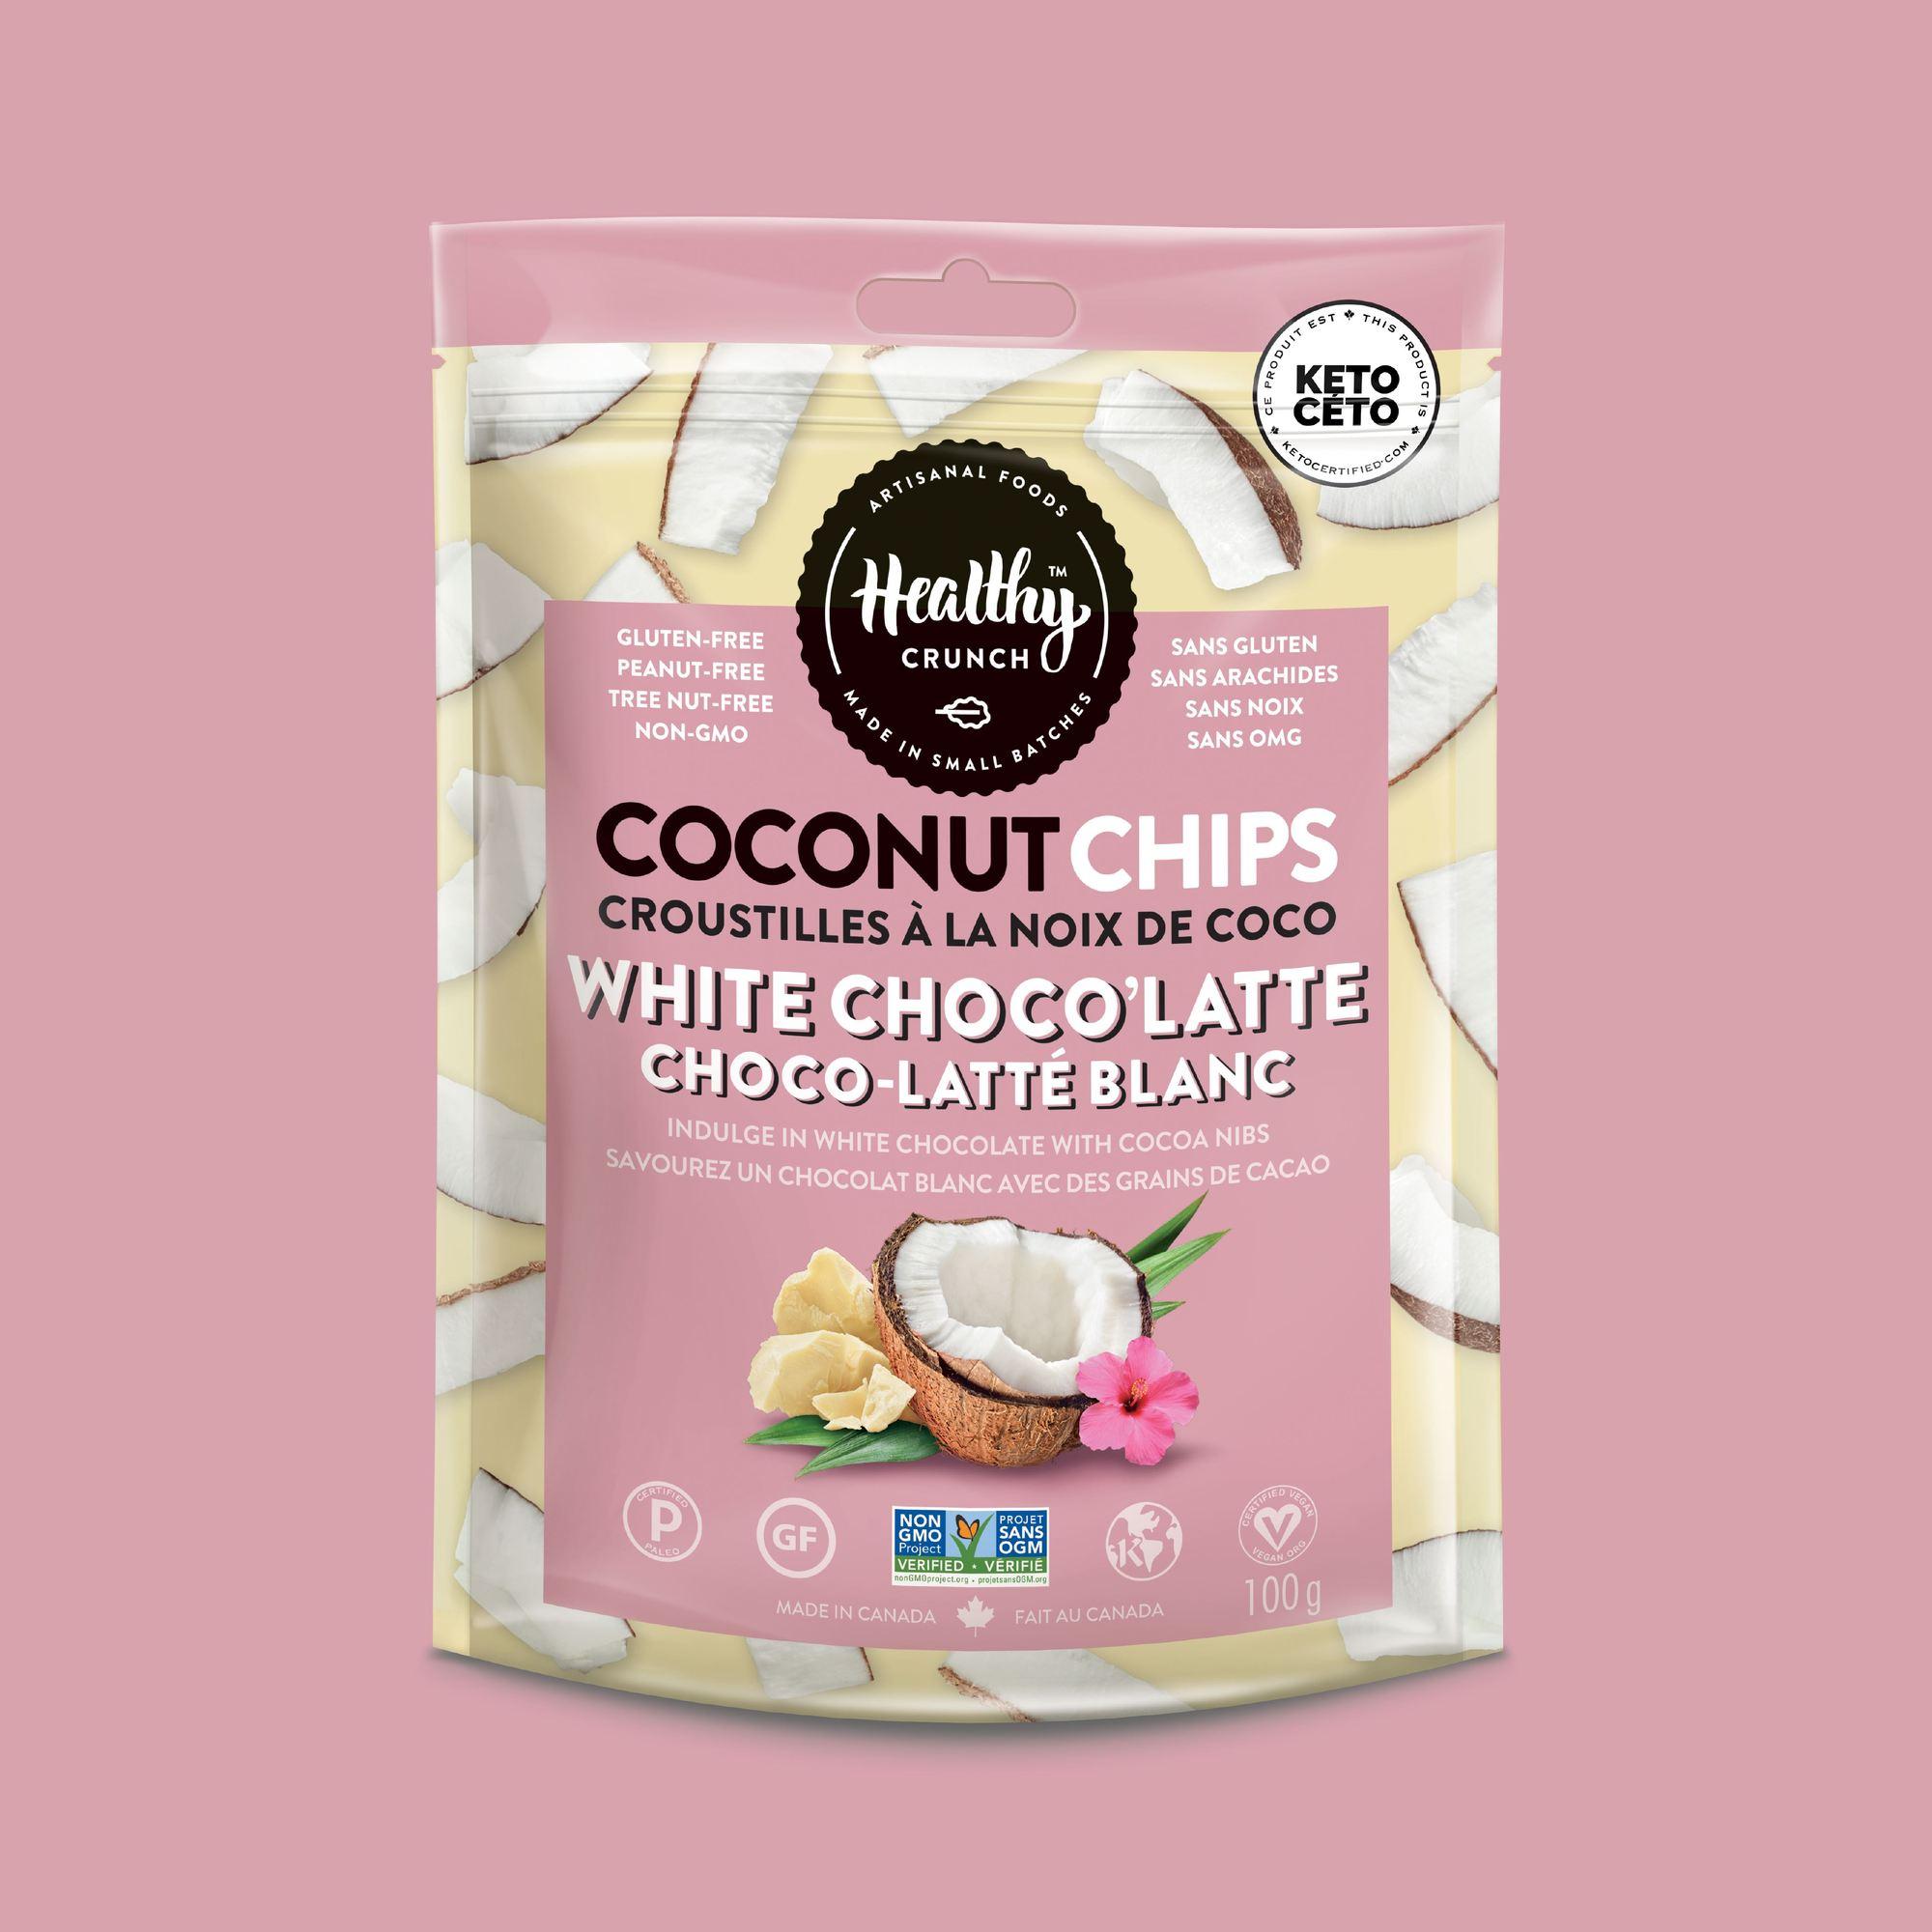 White Choco'Latte Coconut Chips